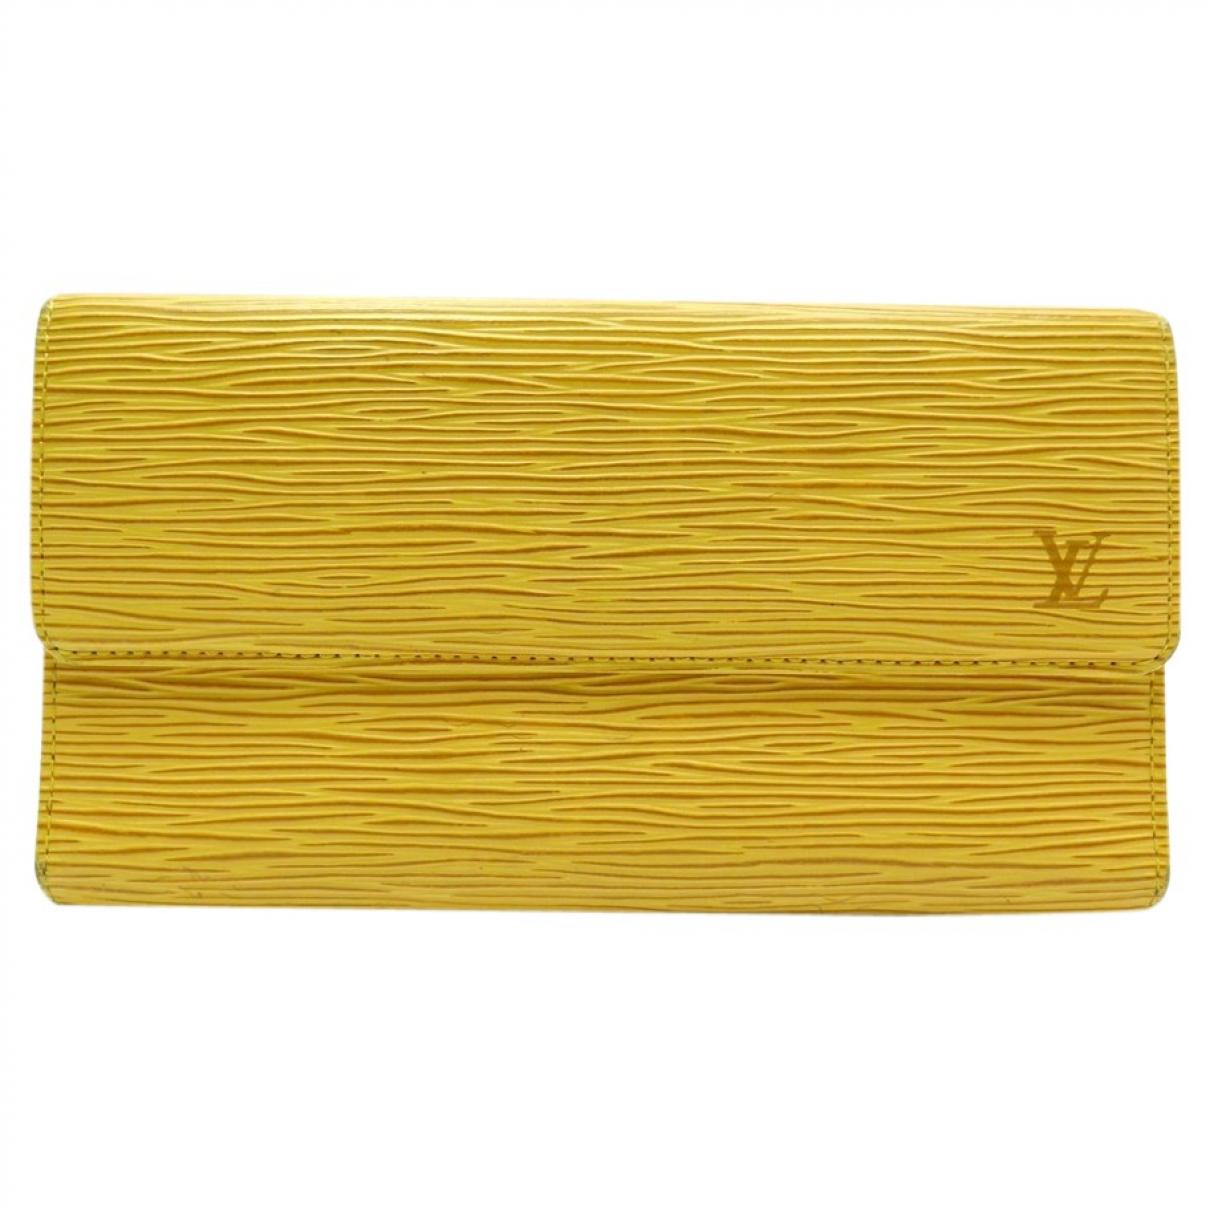 Louis Vuitton Sarah Yellow Leather wallet for Women \N